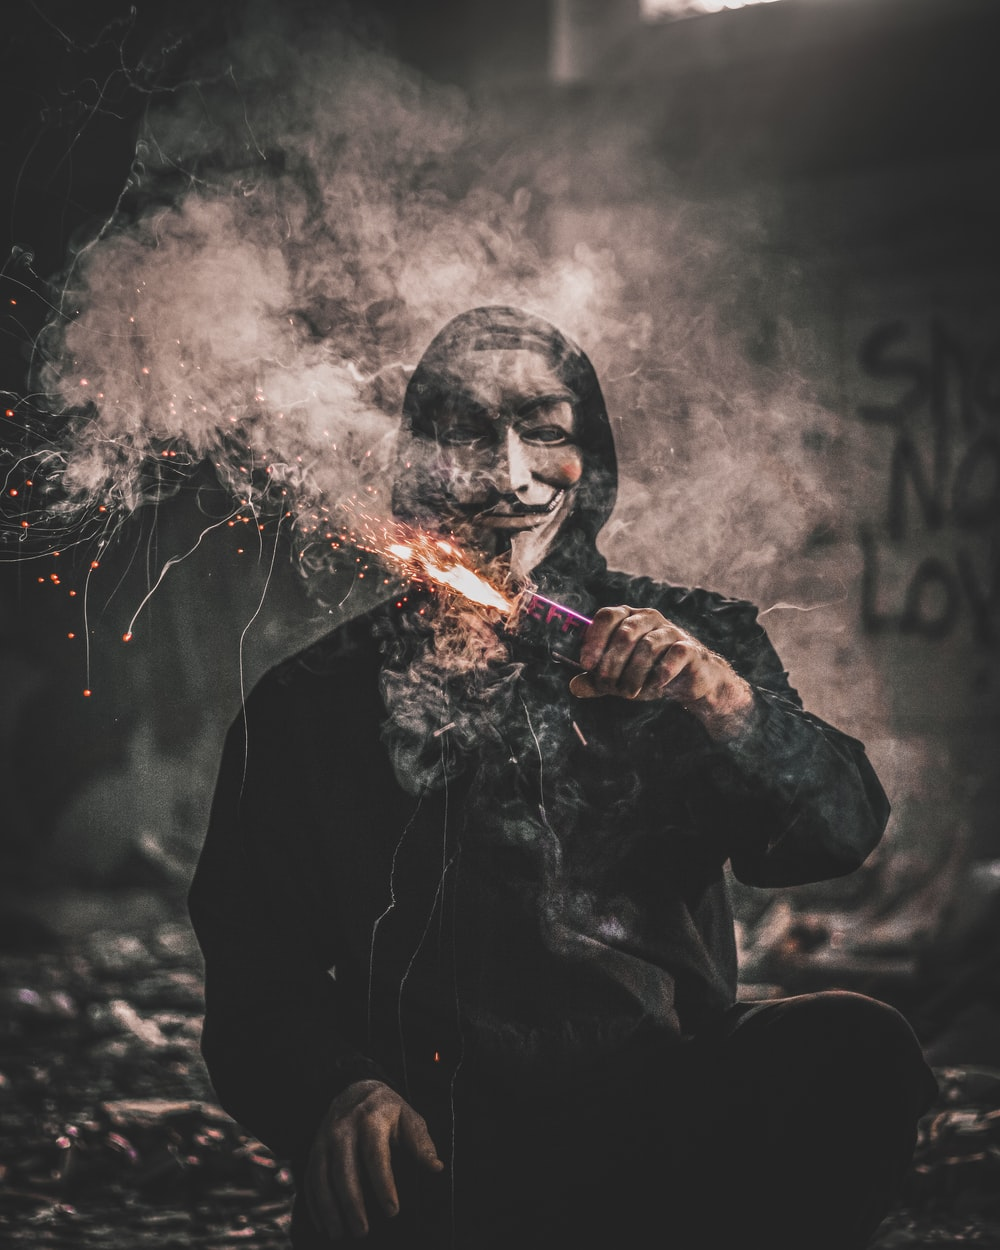 man holding sparkler wearing guy fawkes mask